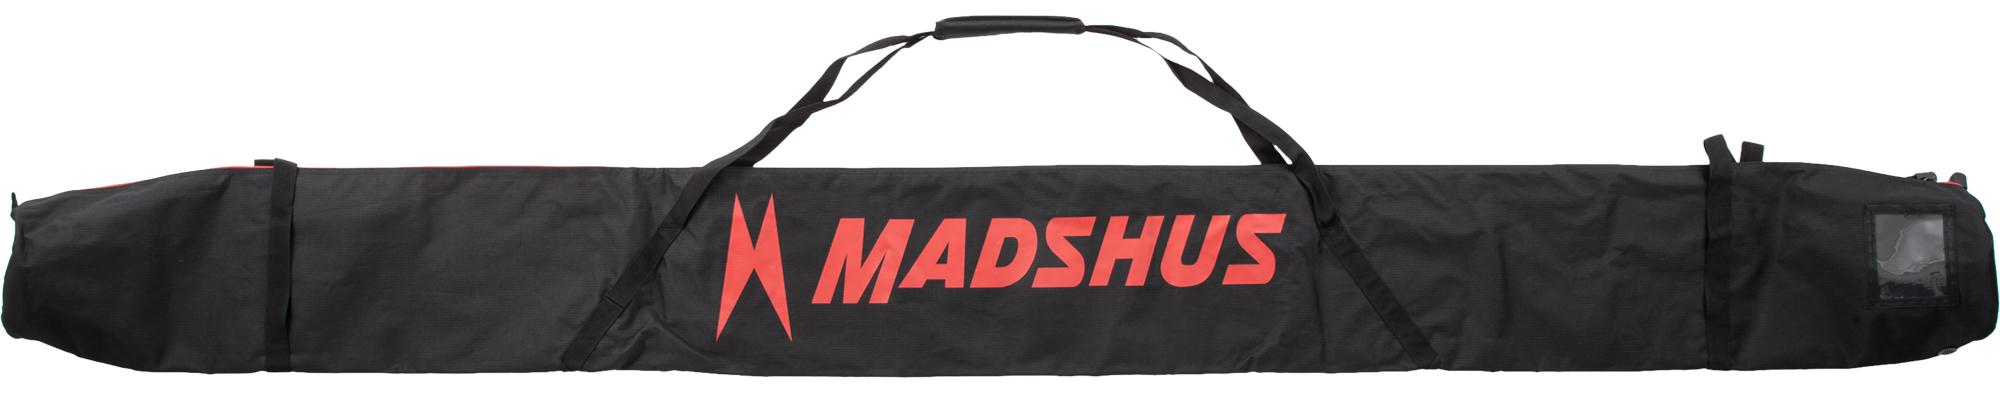 Madshus Чехол для беговых лыж Madshus, размер Без размера палки для беговых лыж cliff 140 blue